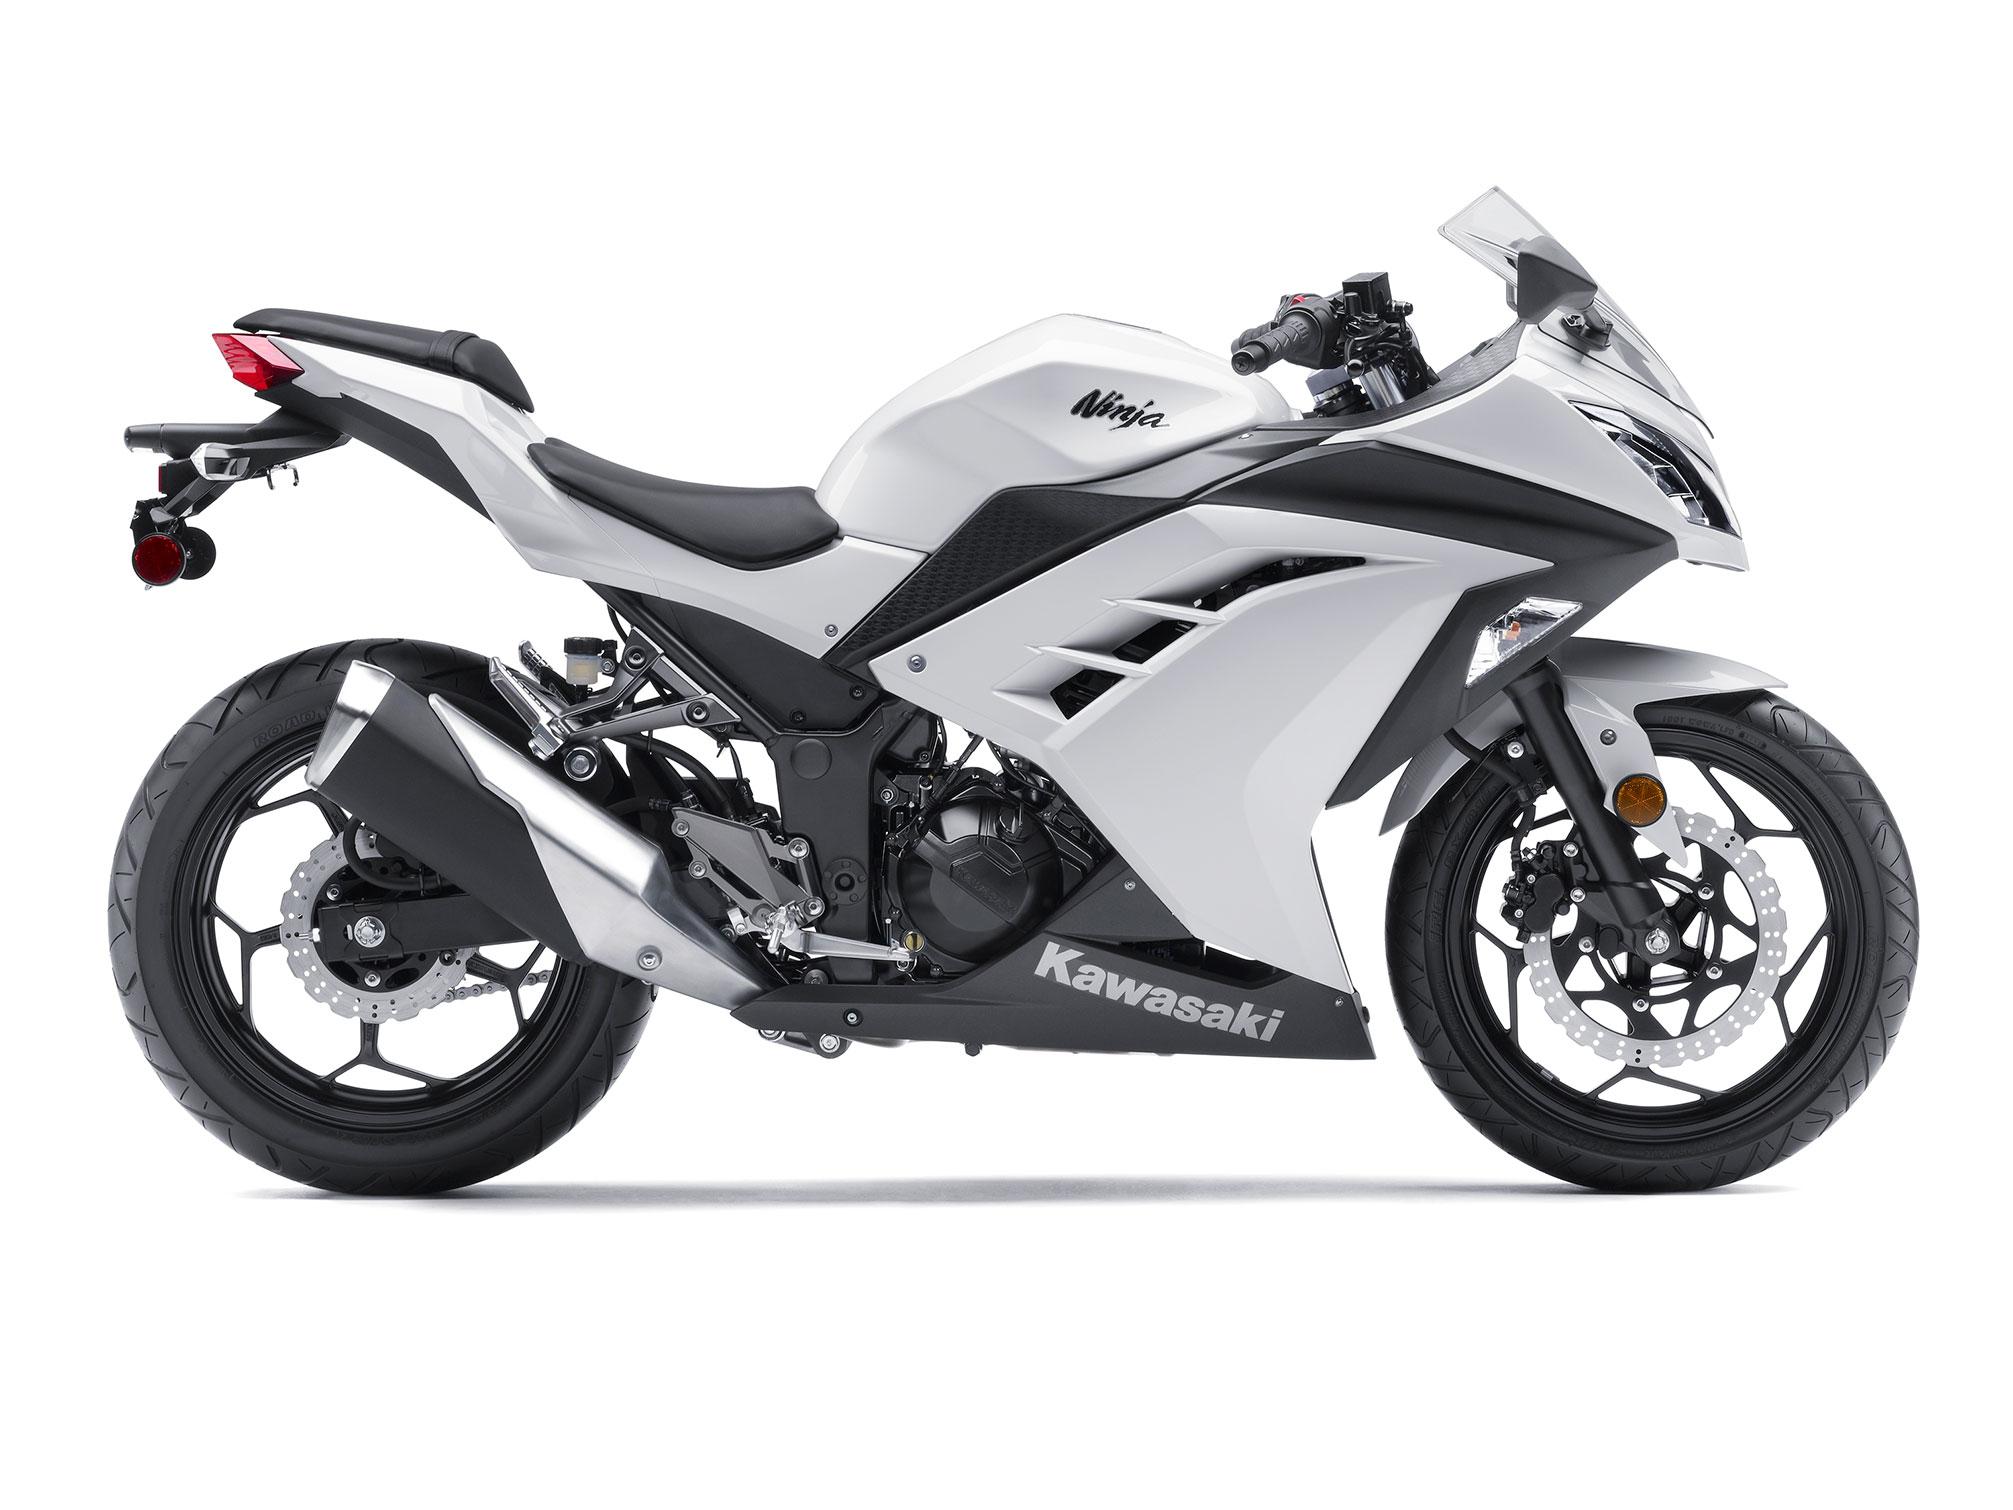 Kawasaki Ninja Abs Se Mtake